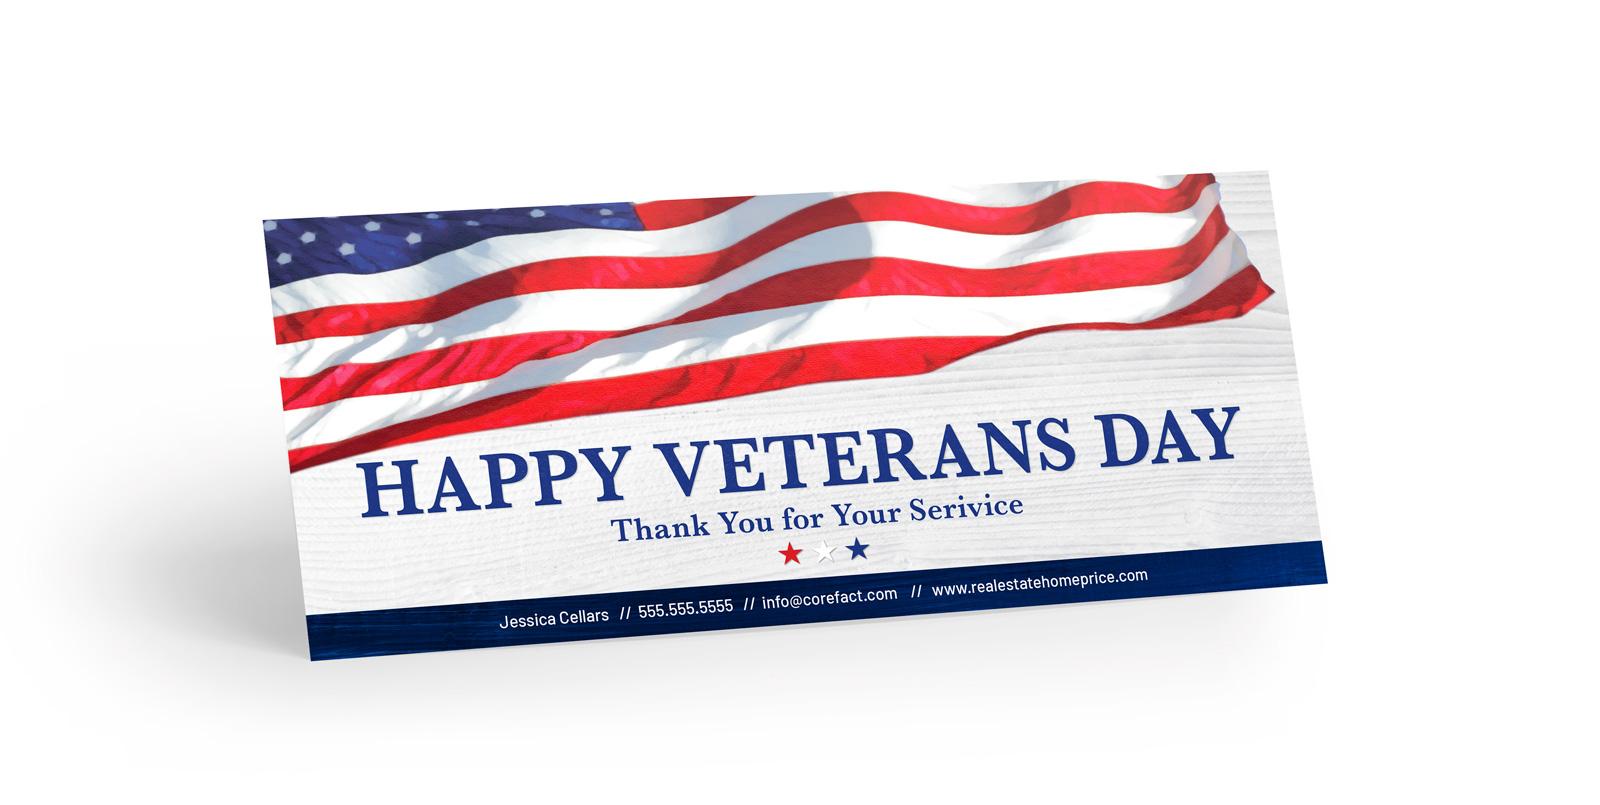 Corefact Seasonal - Veterans Day